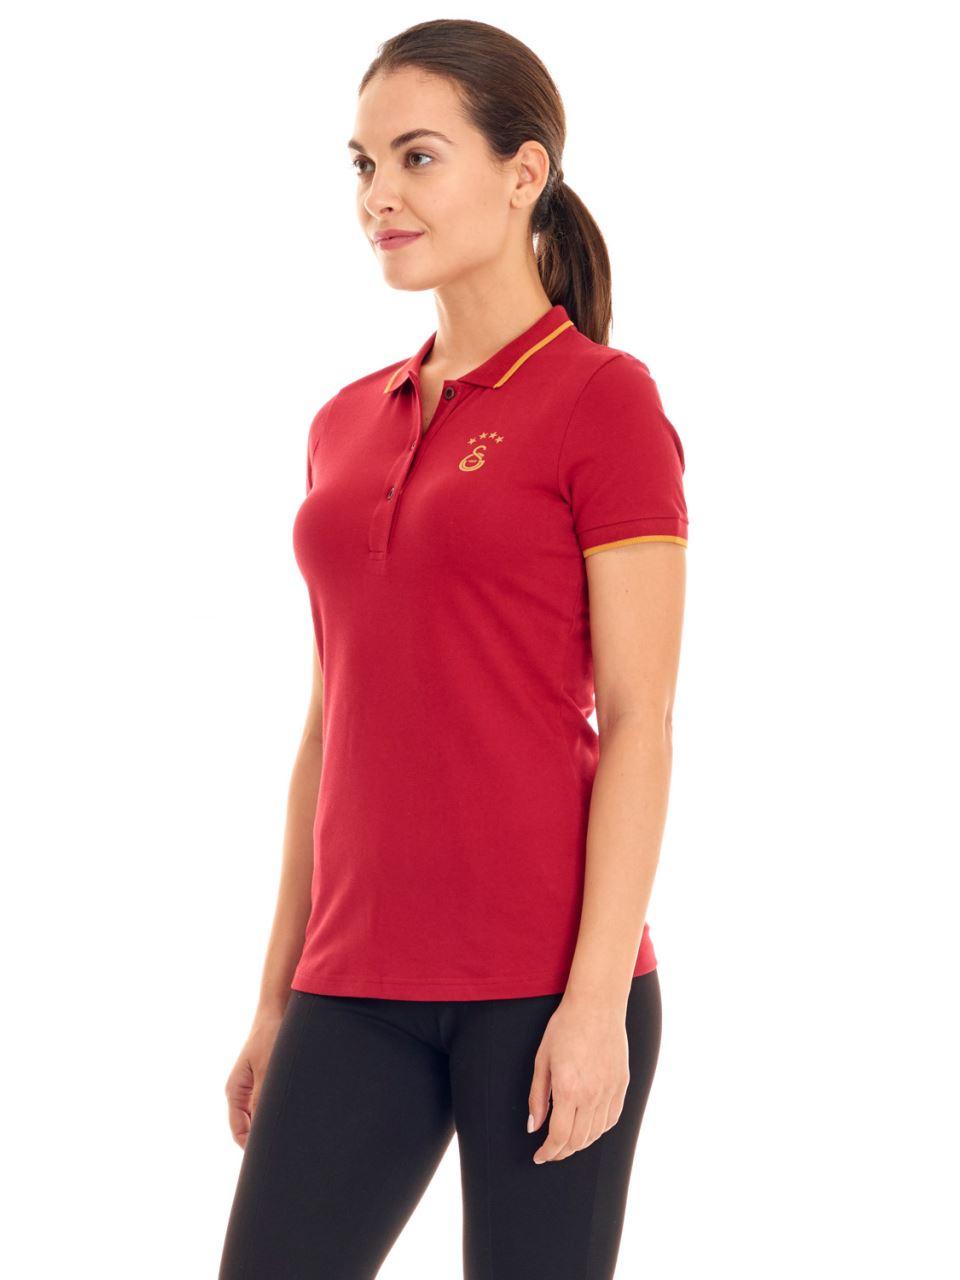 K88063 Polo T-shirt